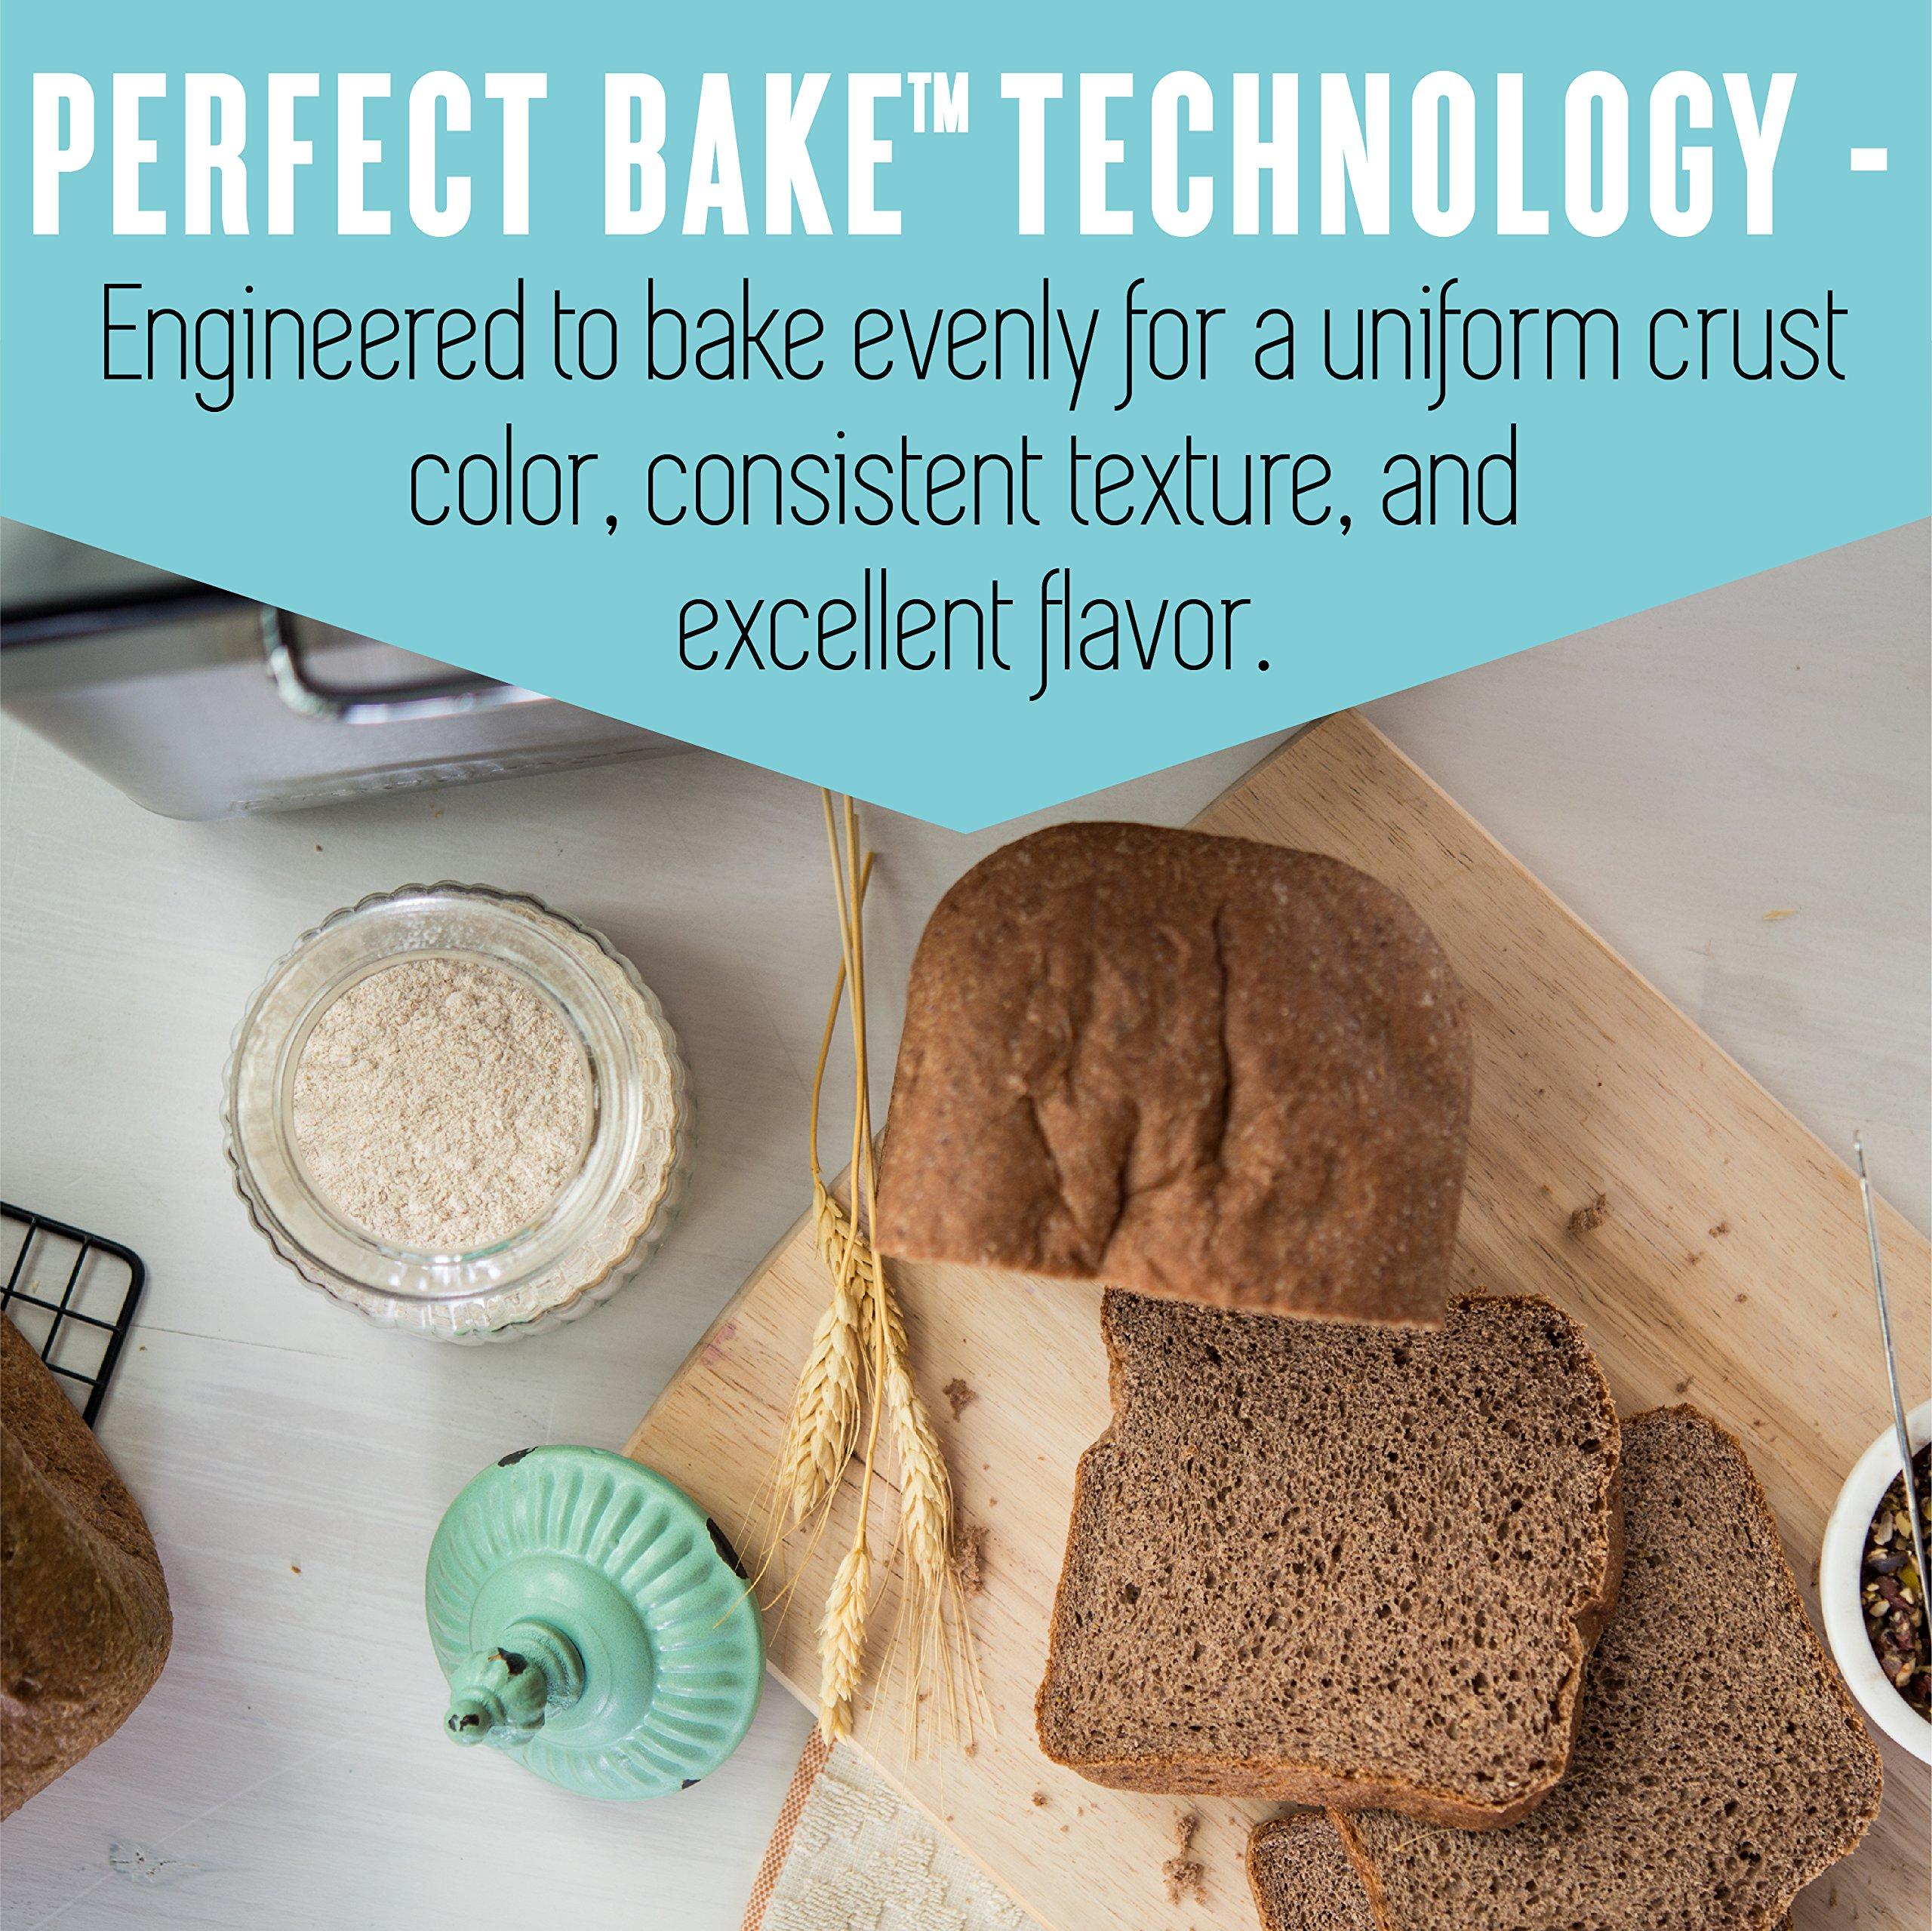 Breadman 2 lb Professional Bread Maker, Stainless Steel, BK1050S by Breadman (Image #6)